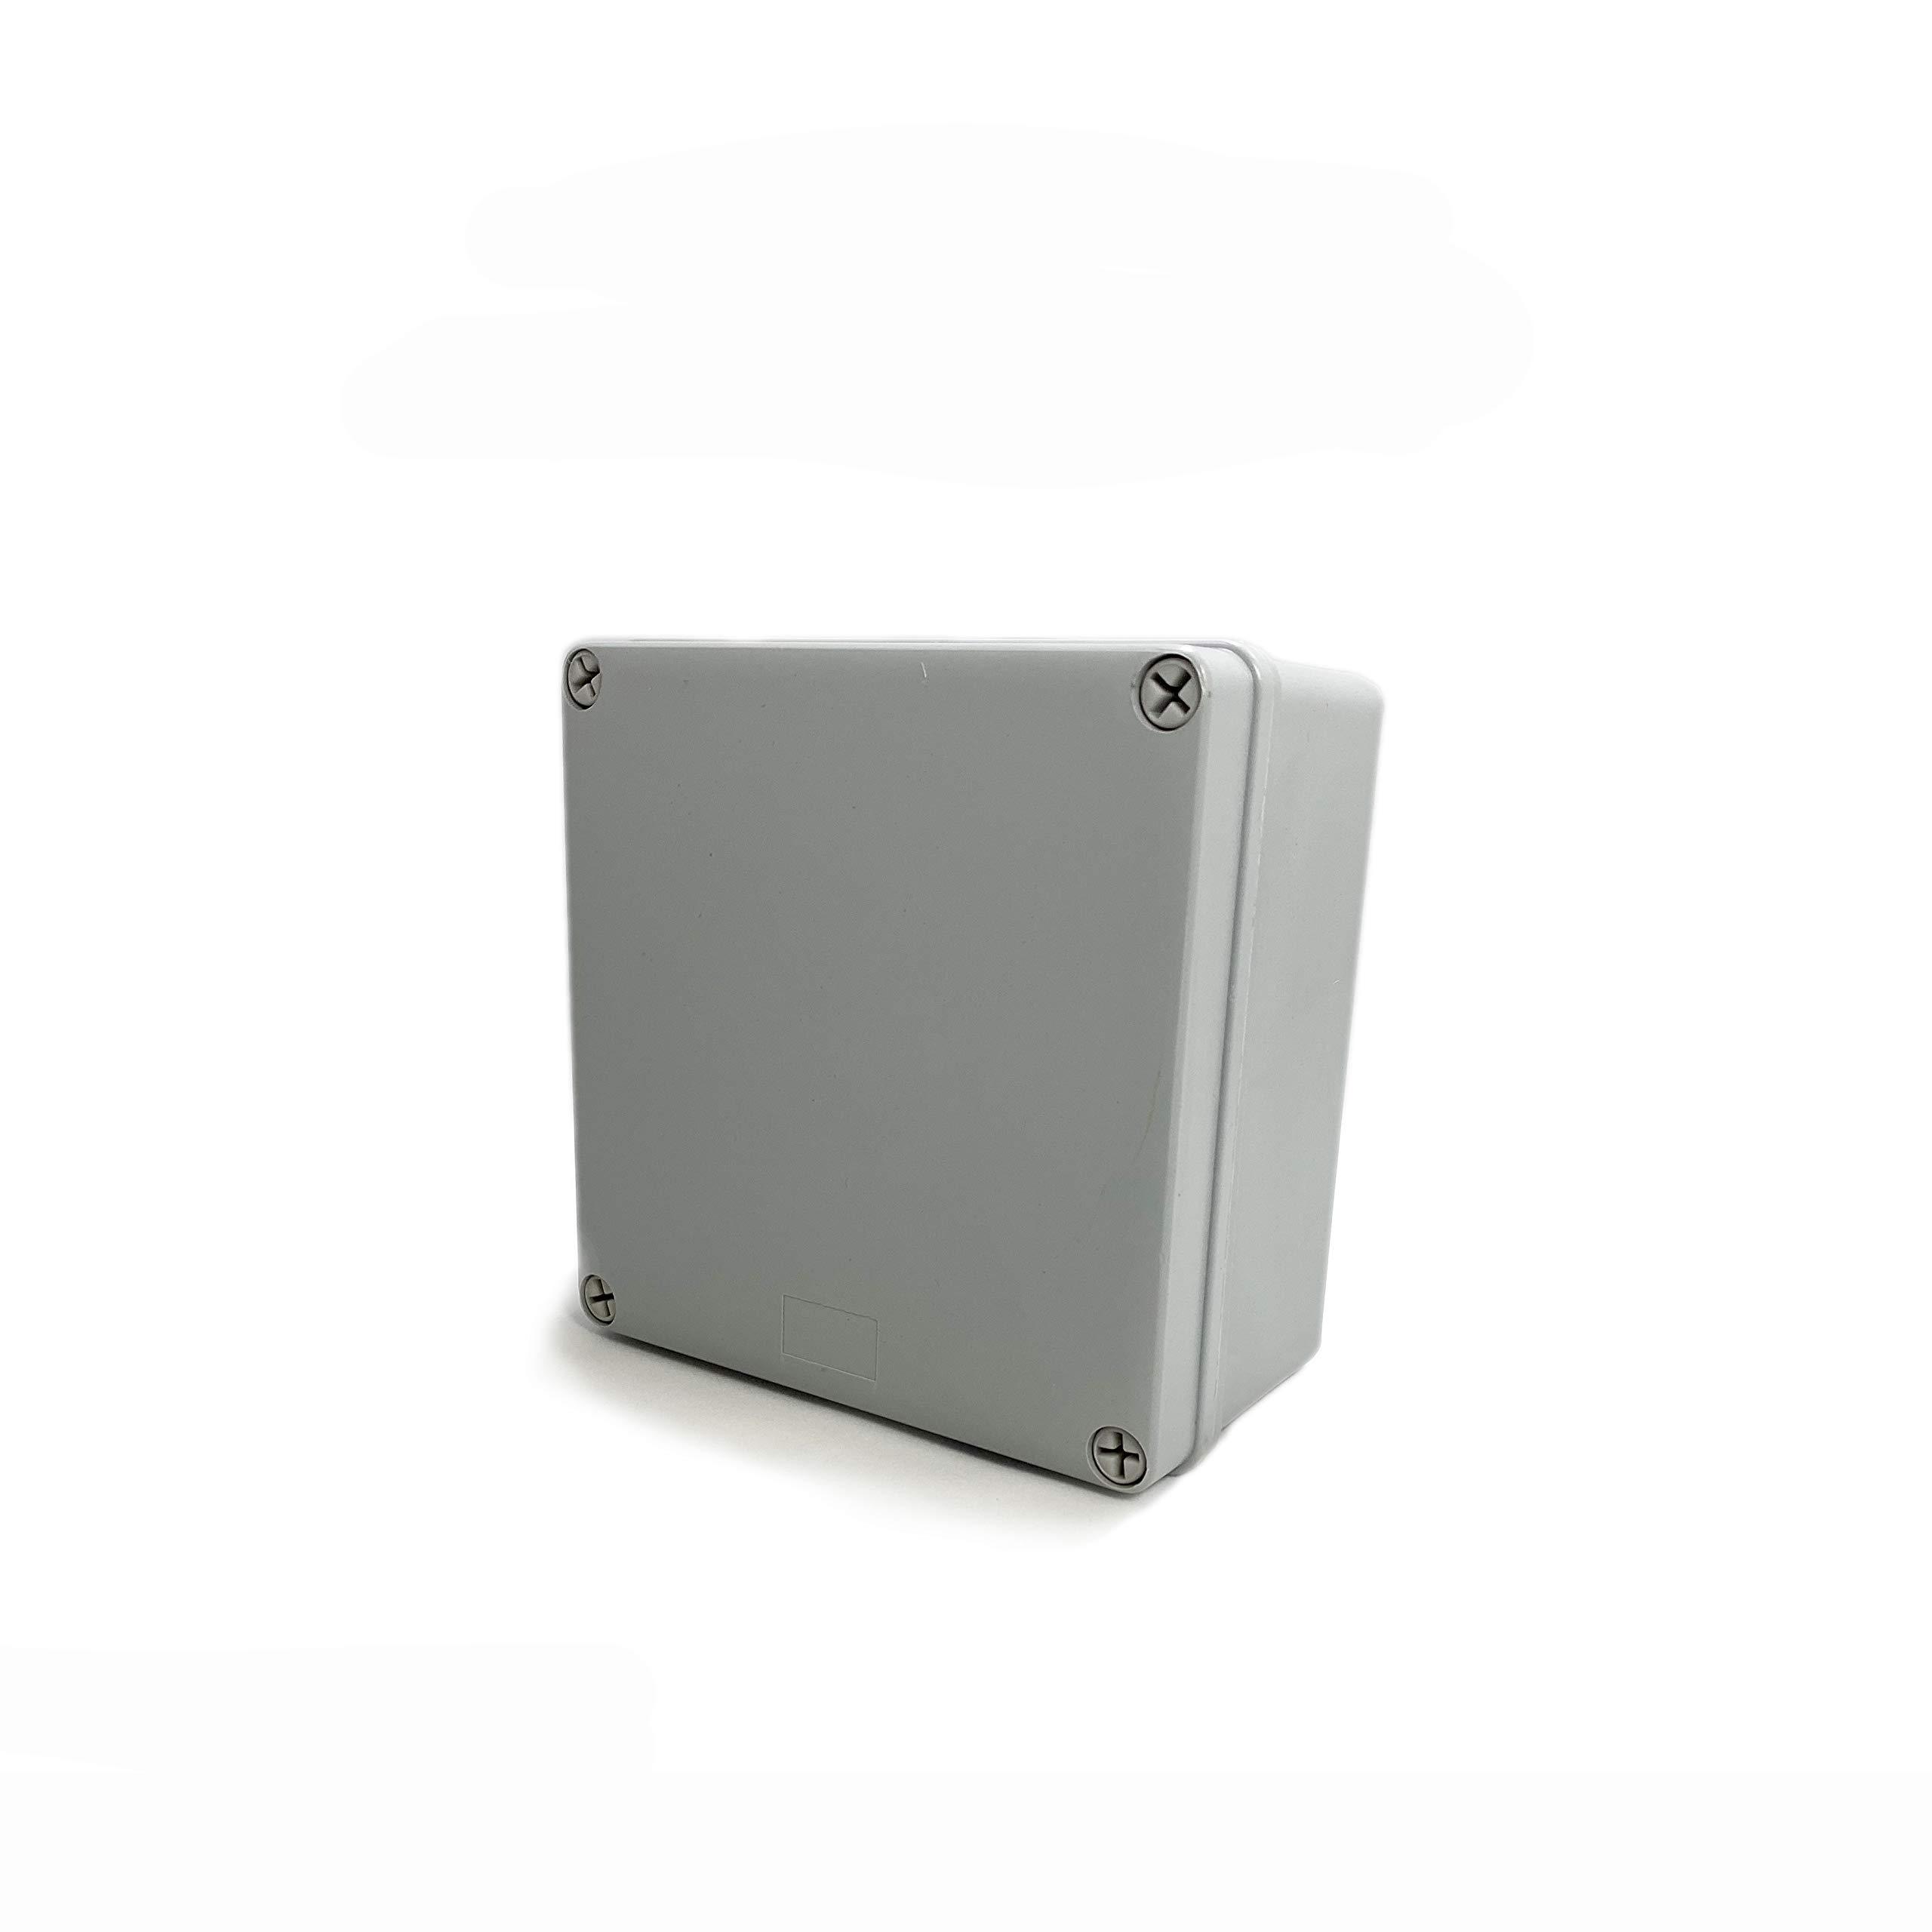 "DJC Supply Co. 4"" x 4"" x 2.4"" Weather & Dust Proof PS Plastic Junction Conduit Box Electronics Enclosure 1 Pack"